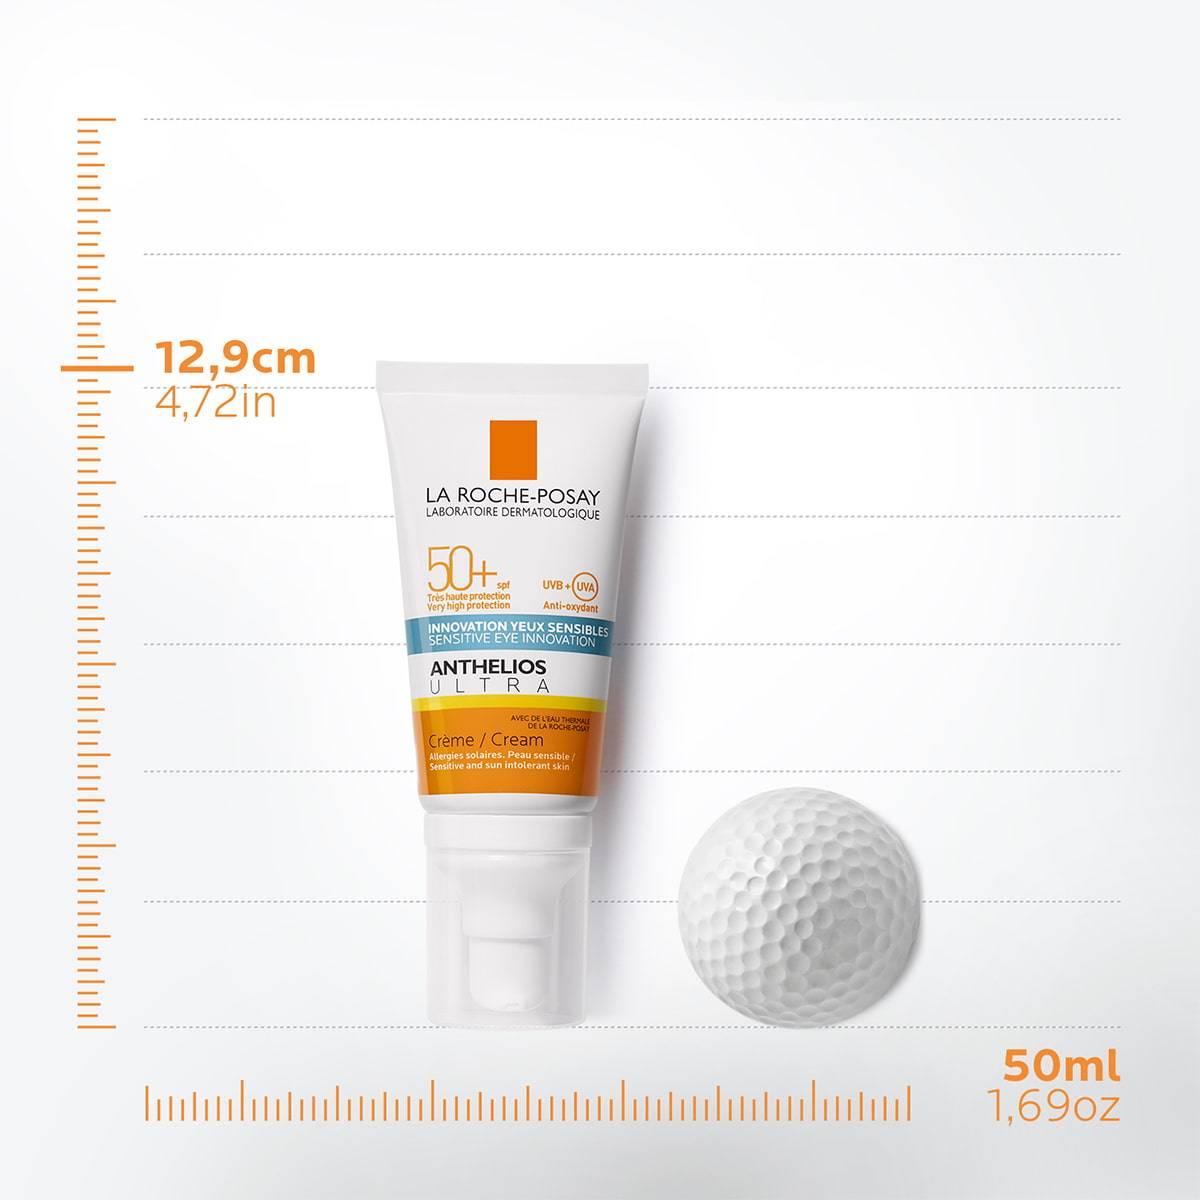 La Roche Posay ProductPage Sun Anthelios Ultra Face Cream Spf50 50ml 3